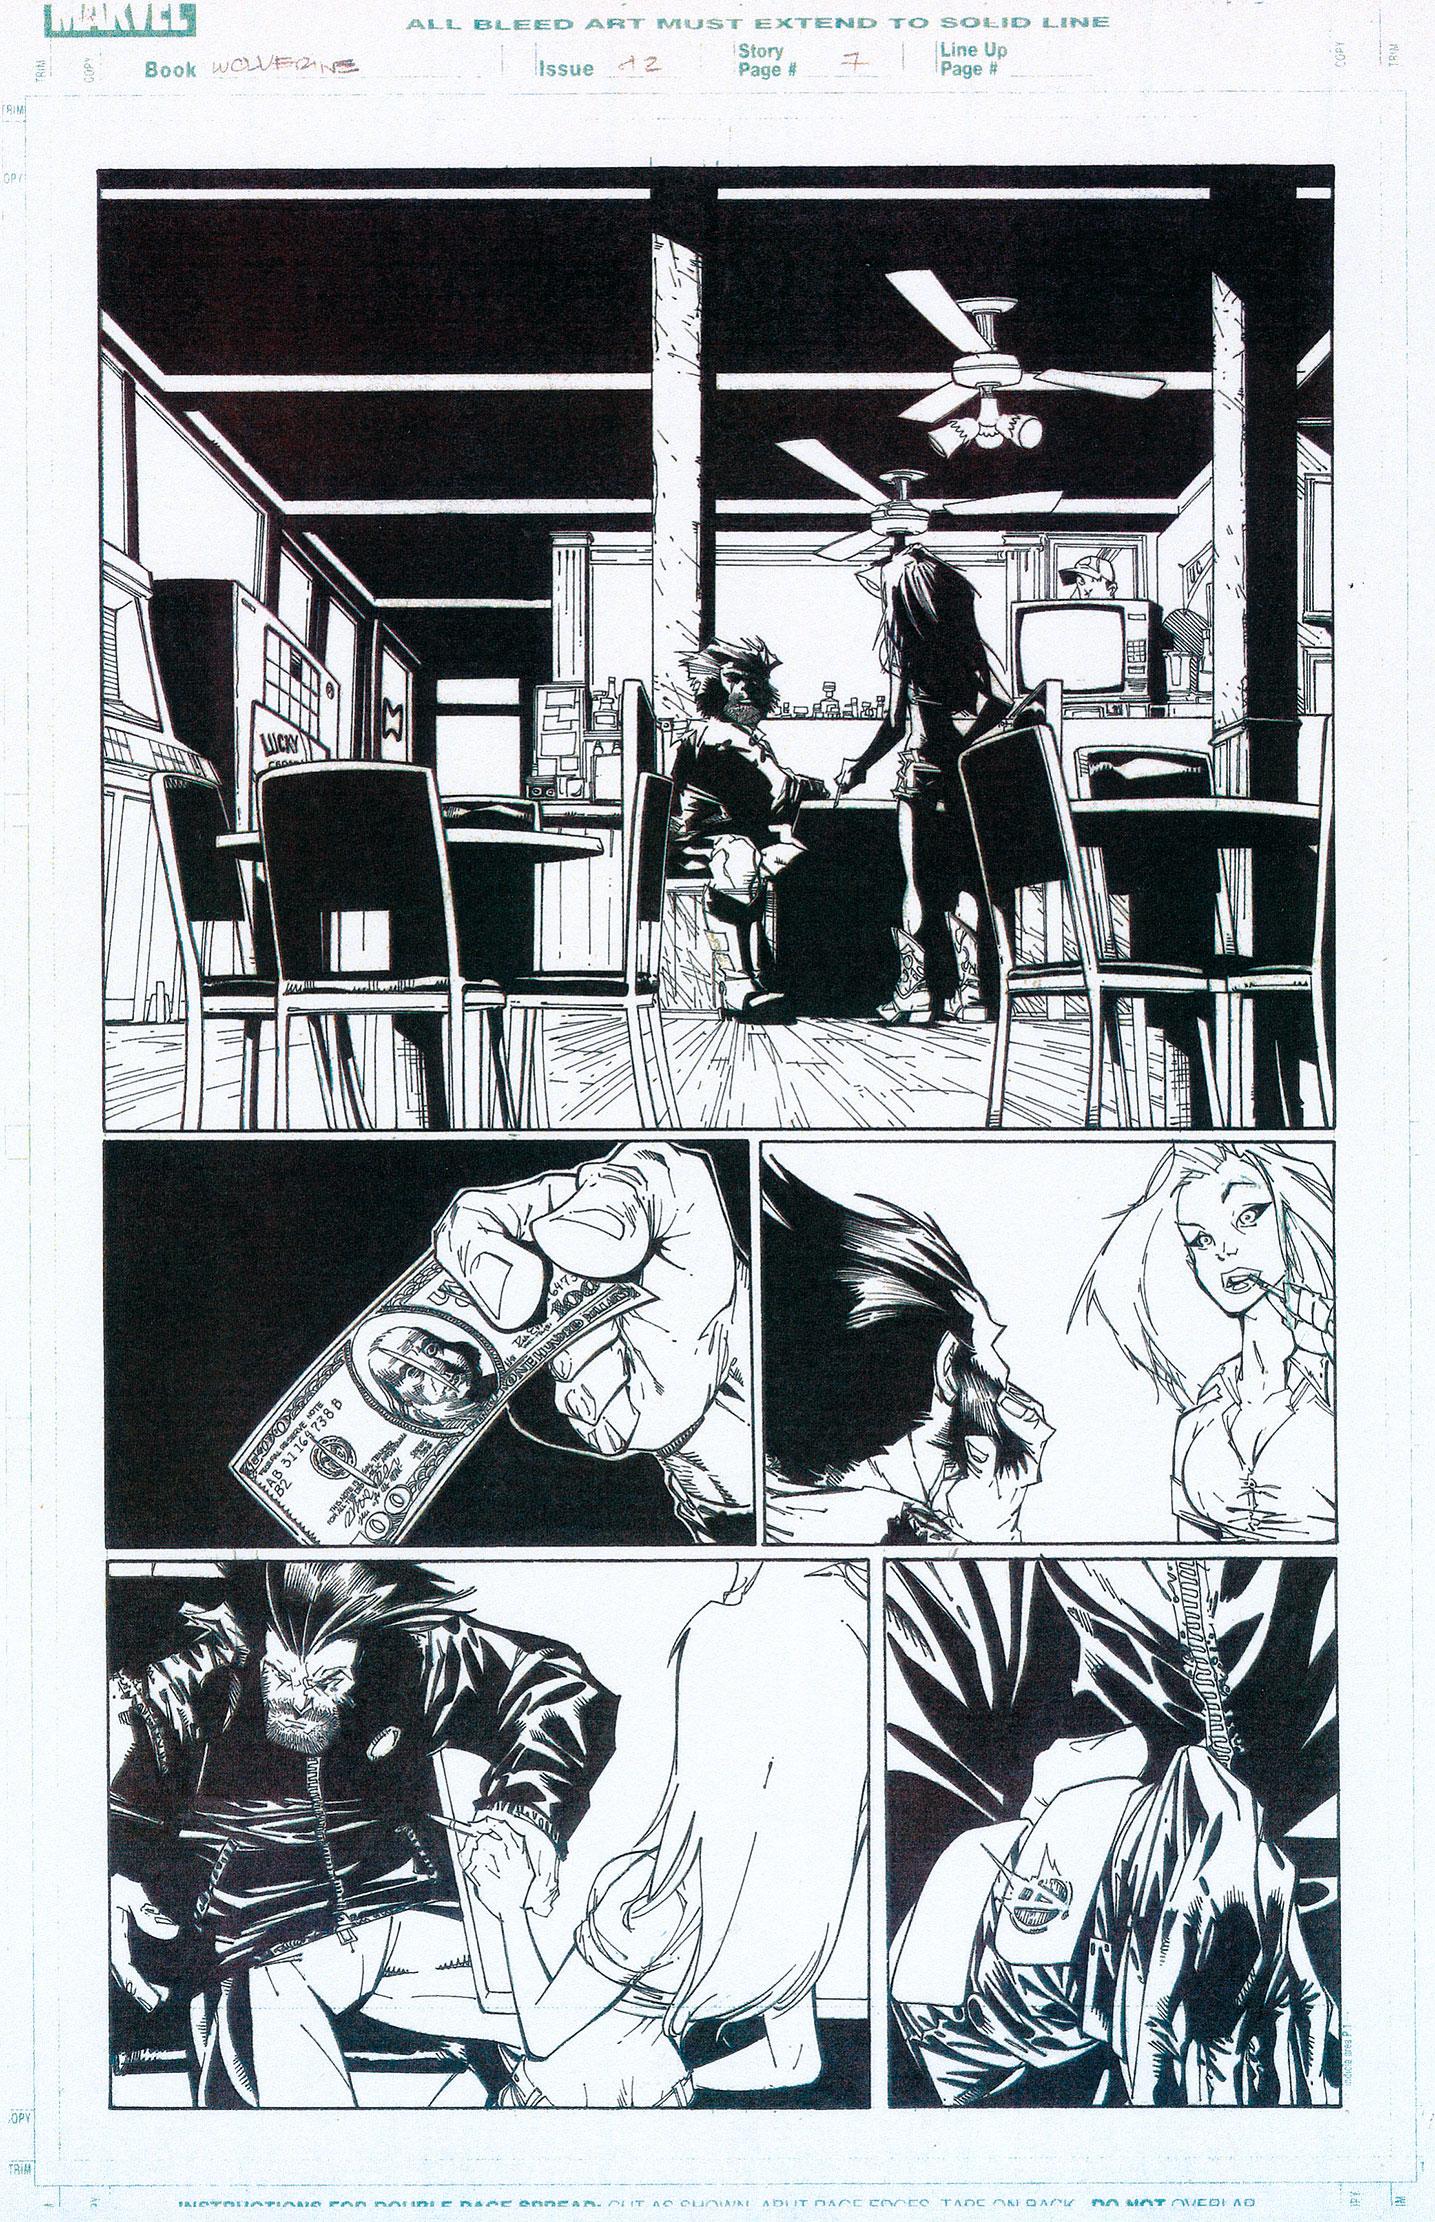 HUMBERTO RAMOS 2003 WOLVERINE #42 P.6 Comic Art